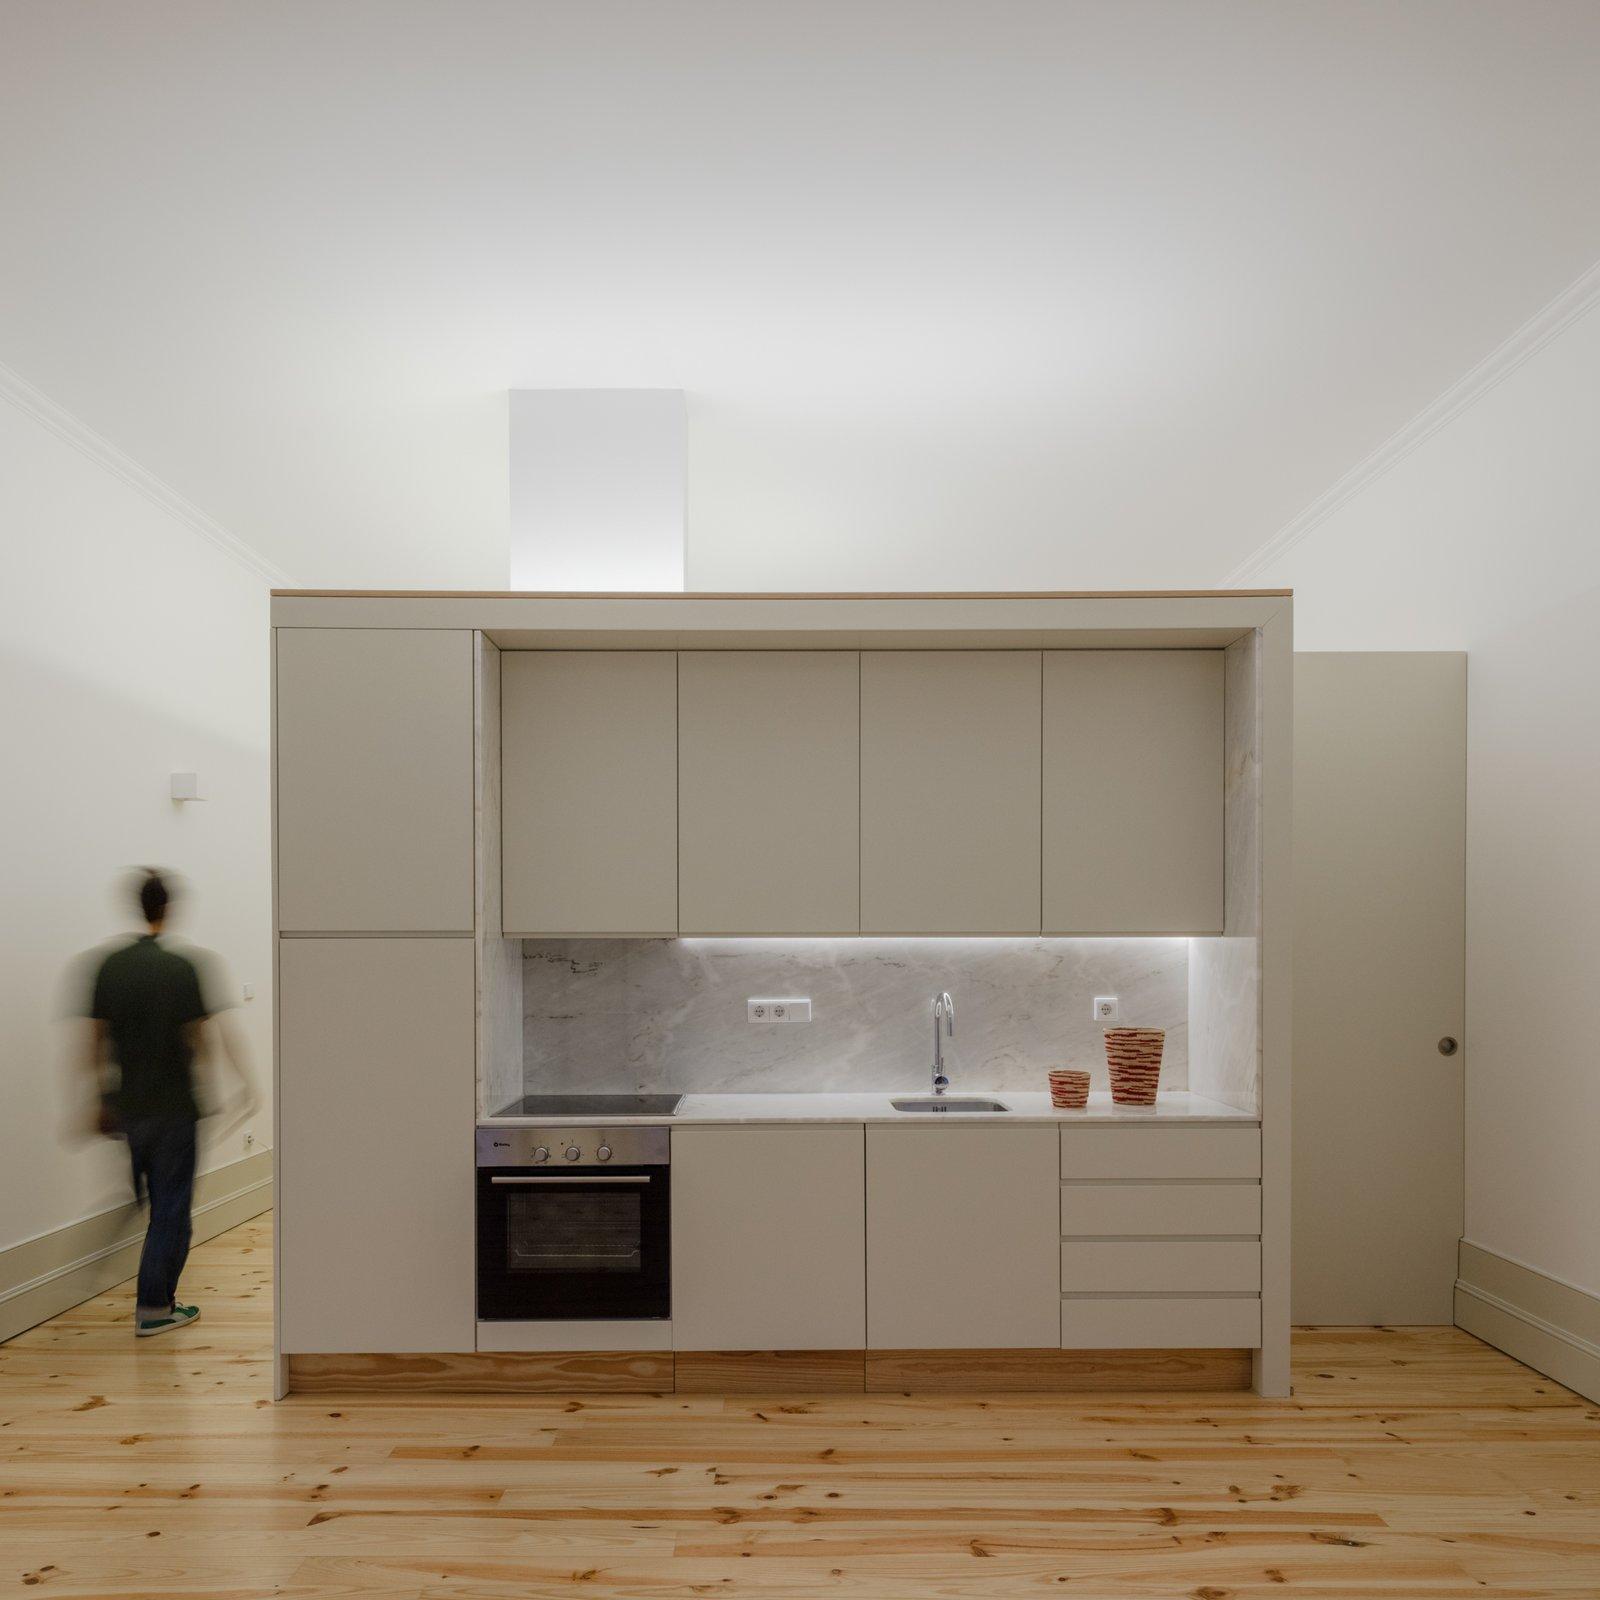 Kitchen, Light Hardwood Floor, White Cabinet, Marble Counter, and Marble Backsplashe  Rua da Boavista